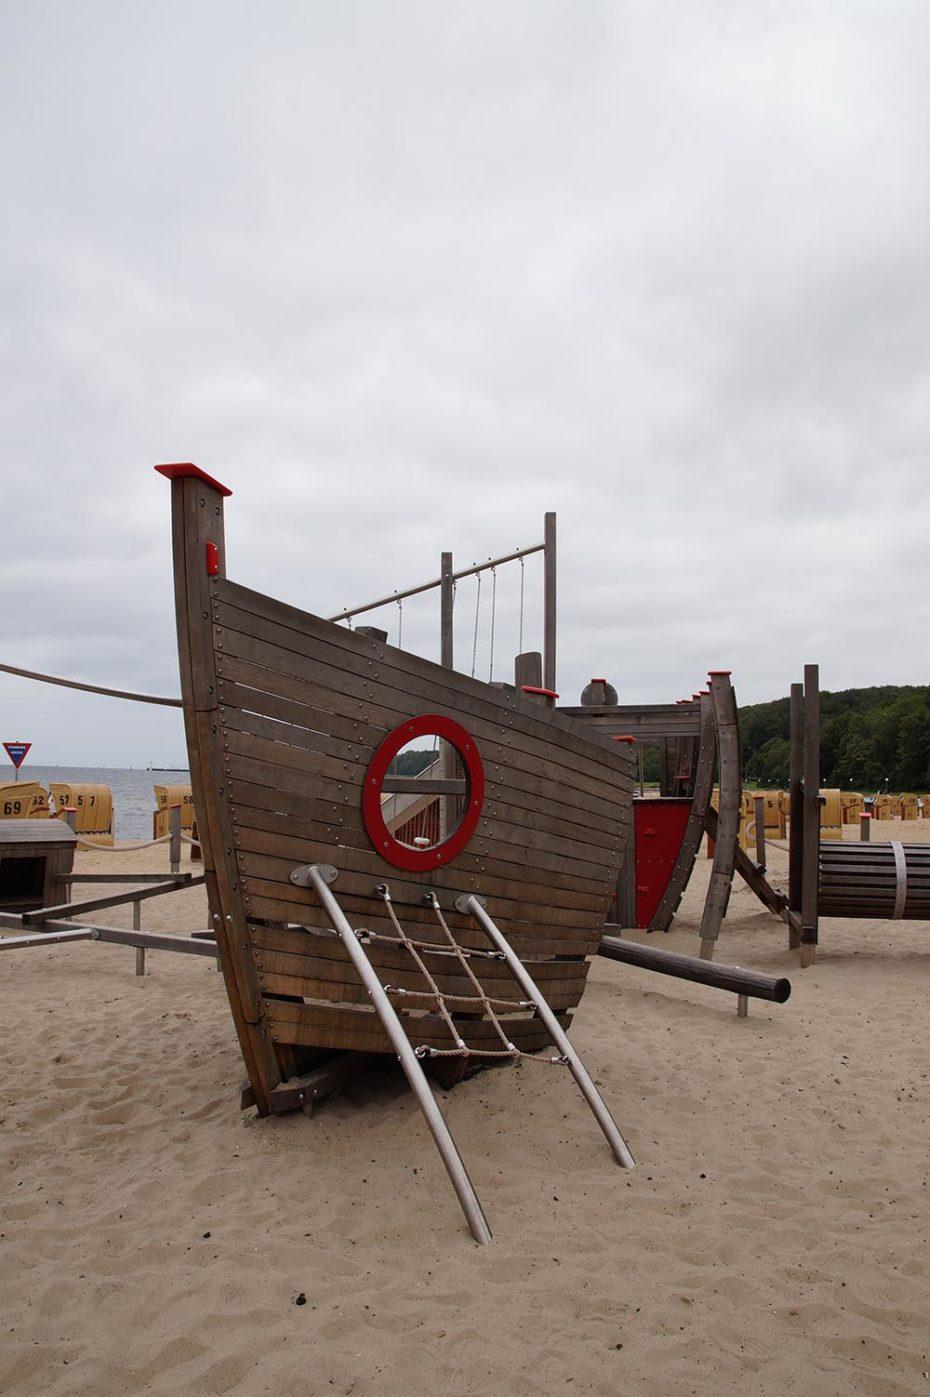 Spielplatz am Strand in Kiel